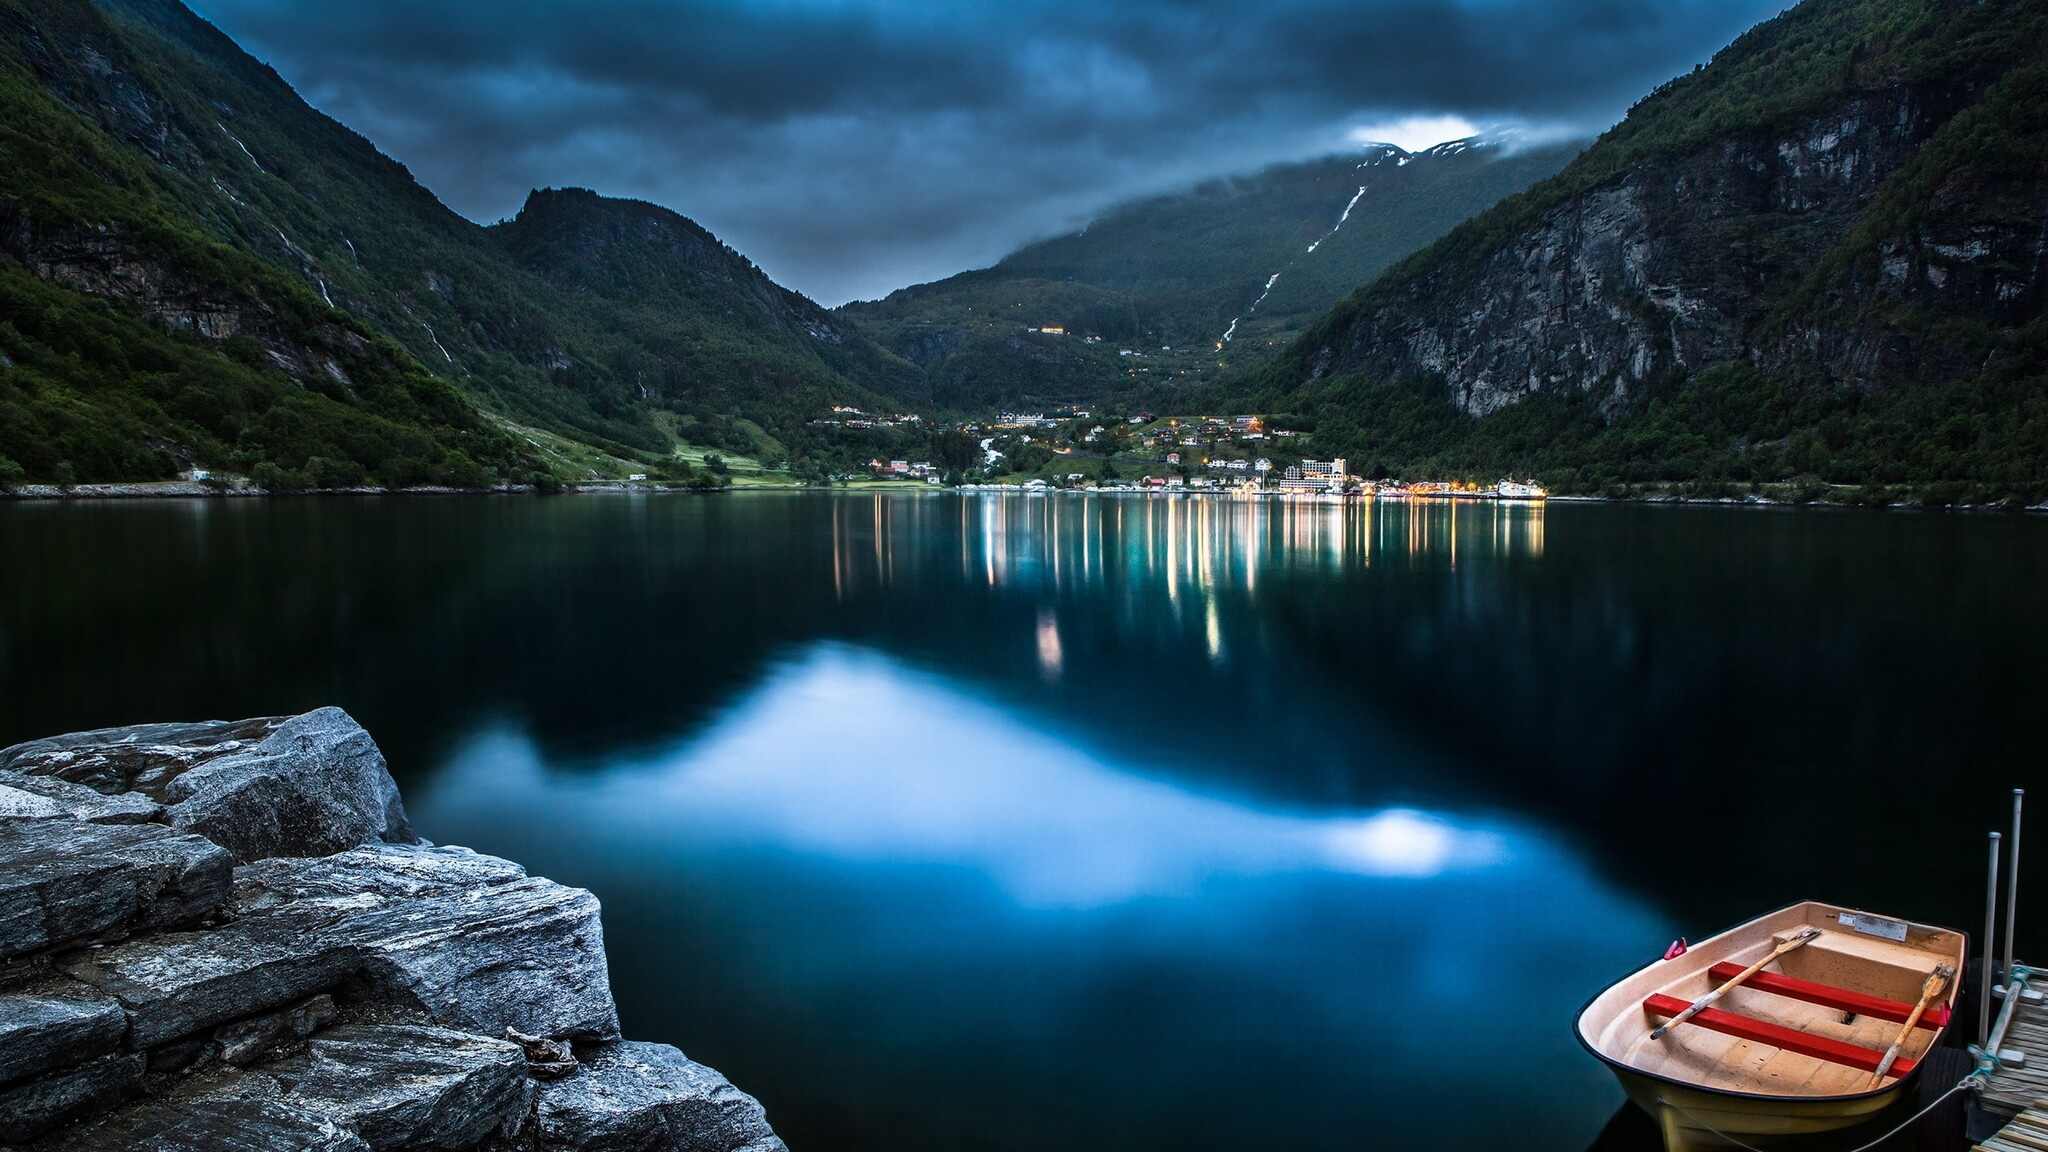 Cute Wallpapers  2048x1152 Mountain Lake Beautiful Night 2048x1152